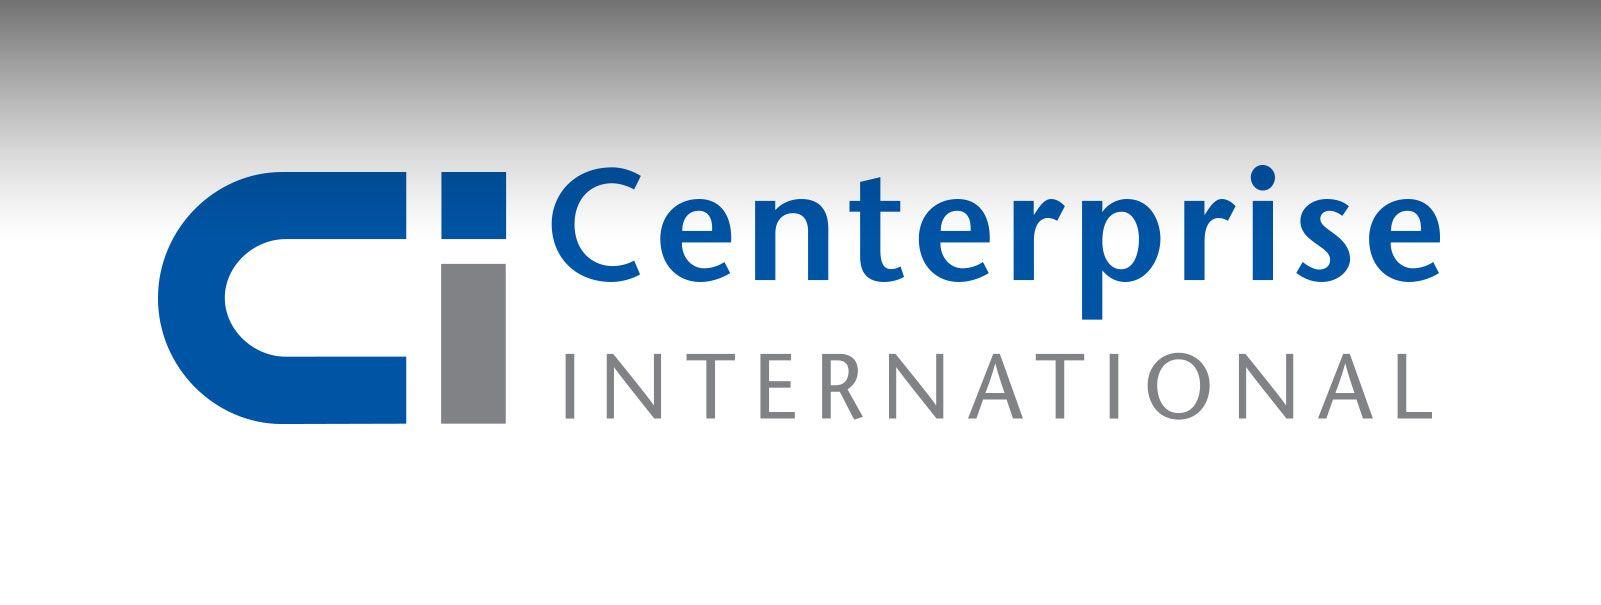 Centerprise International Ltd